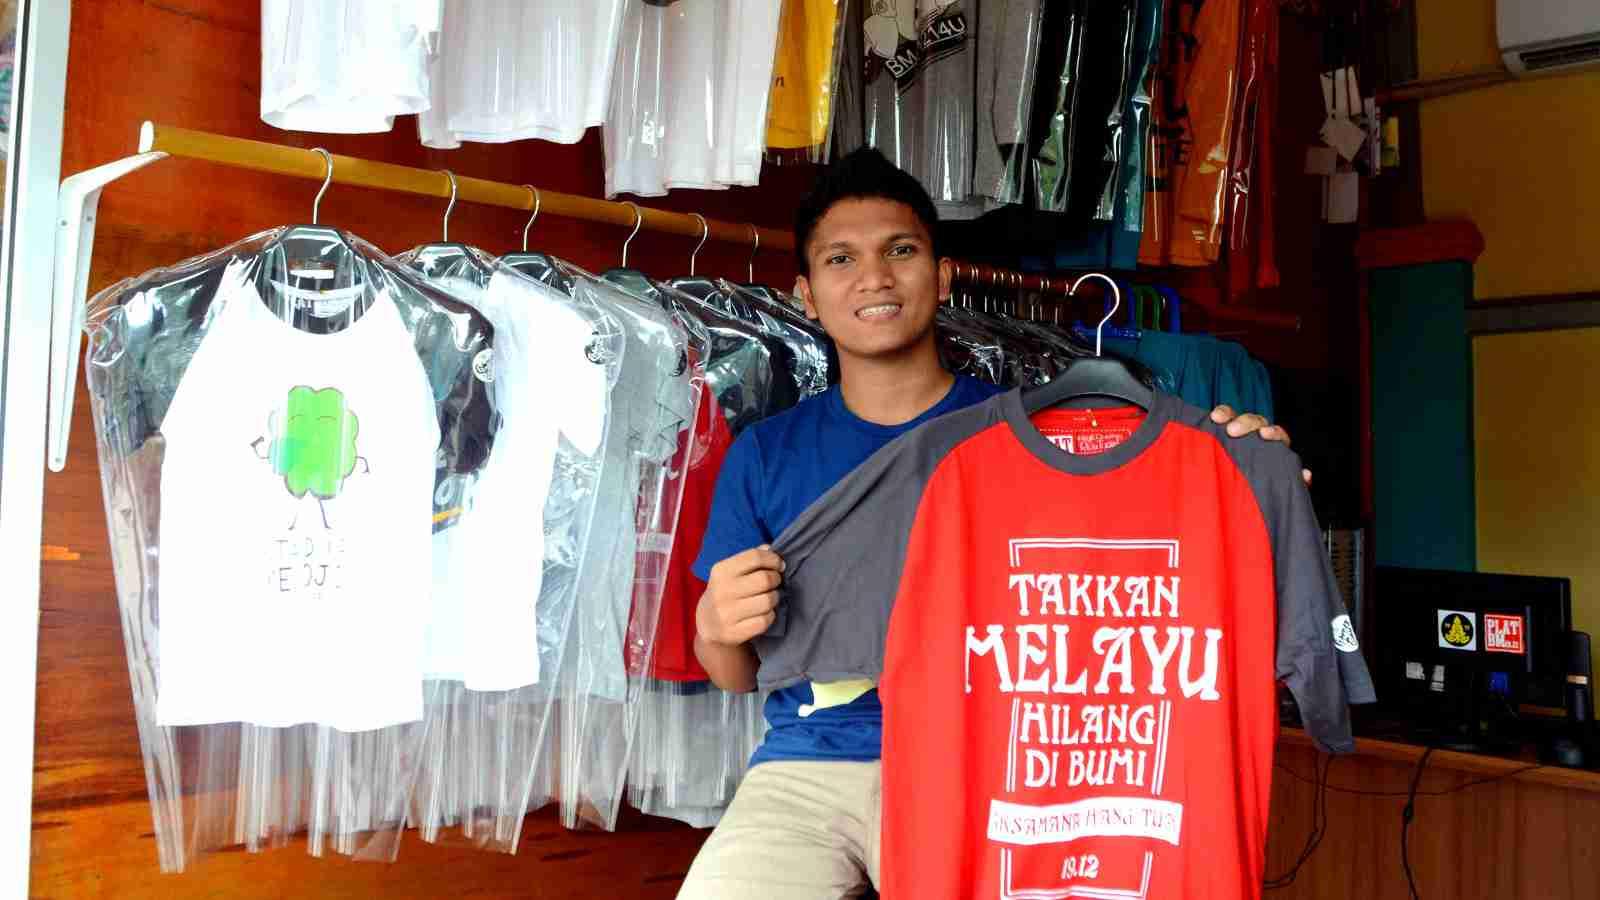 Grosir Kaos Distro Bandung Murah, Kualitas Terjamin Made in Bandung